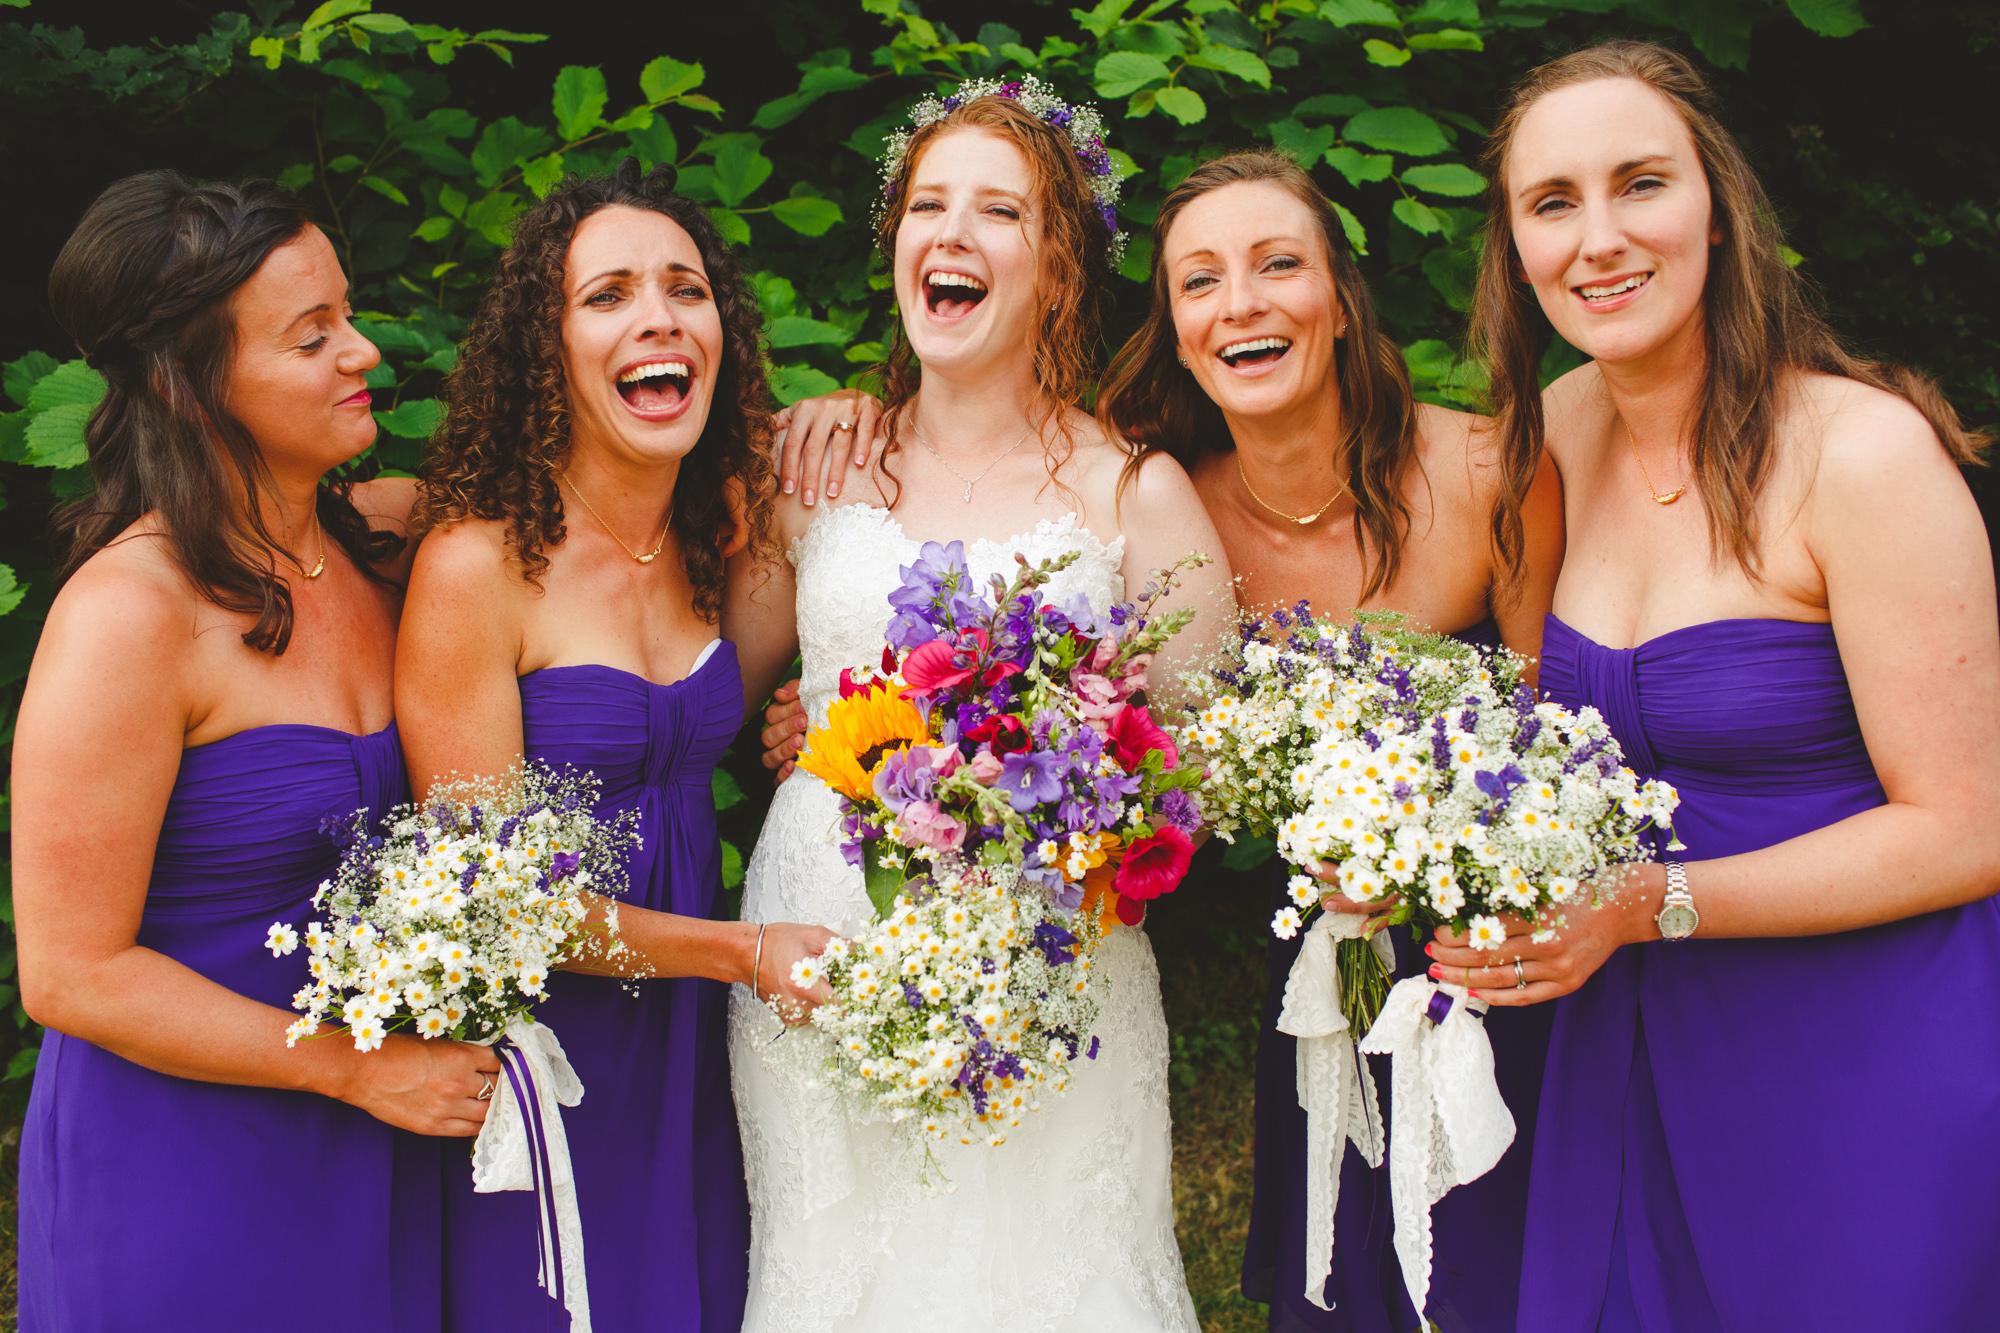 liverpool-town-hall-wedding-photography-16.jpg